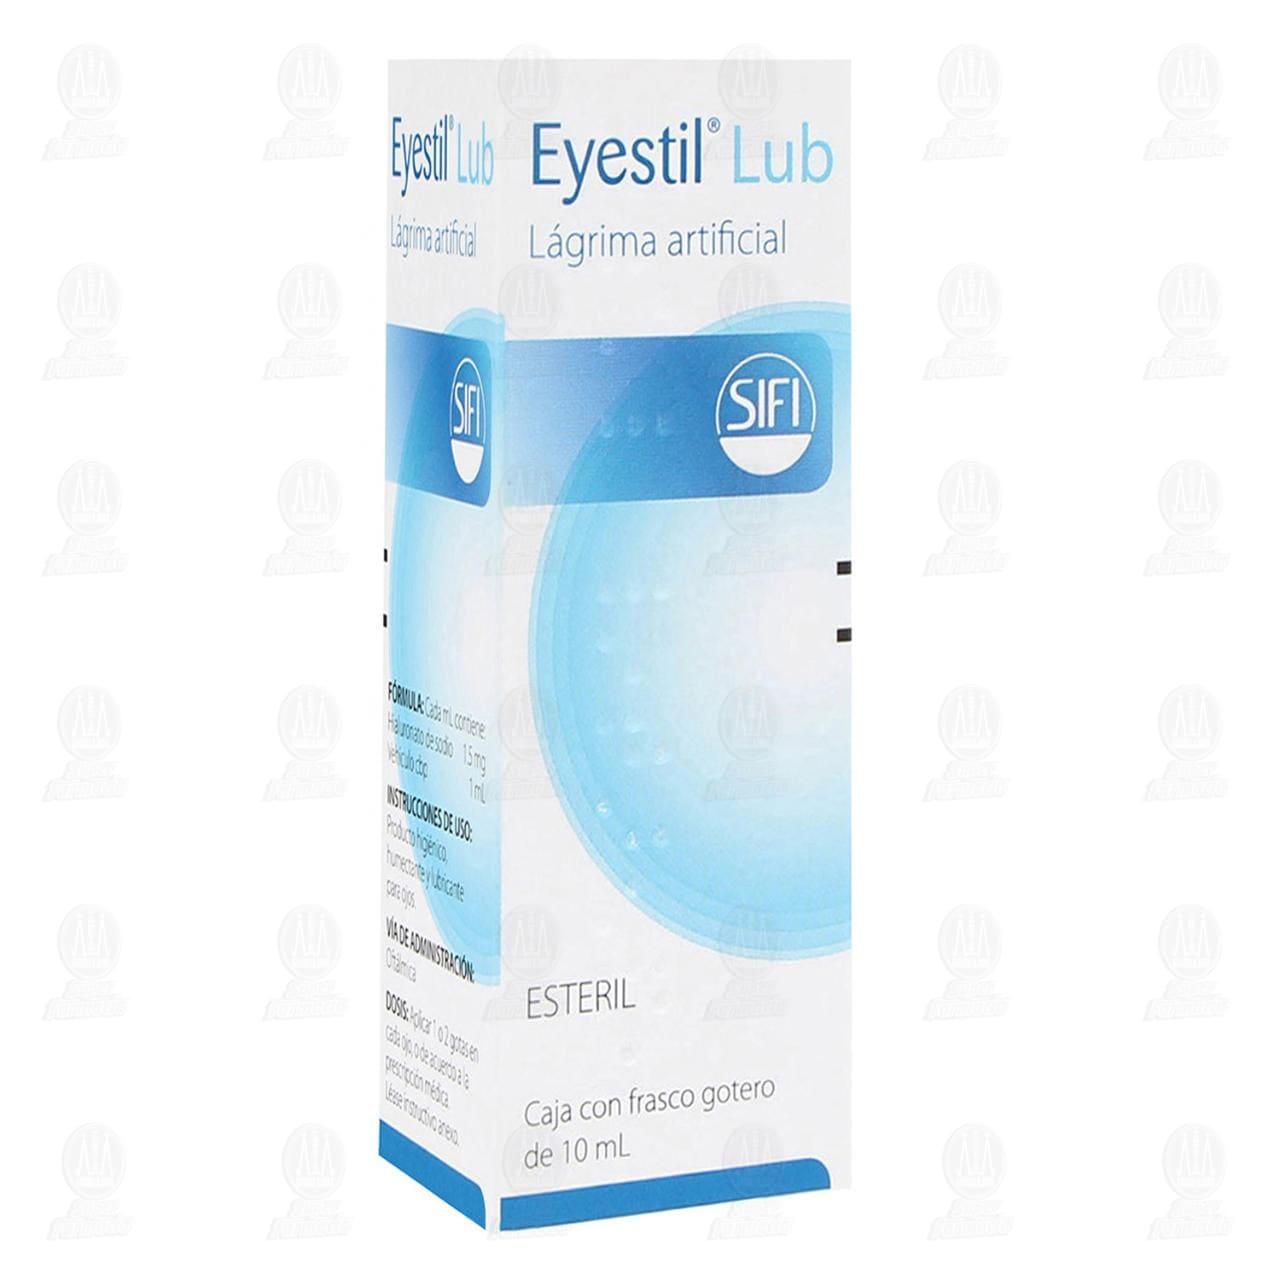 Comprar Eyestil Lubricante 10ml Solución Oftálmica en Farmacias Guadalajara